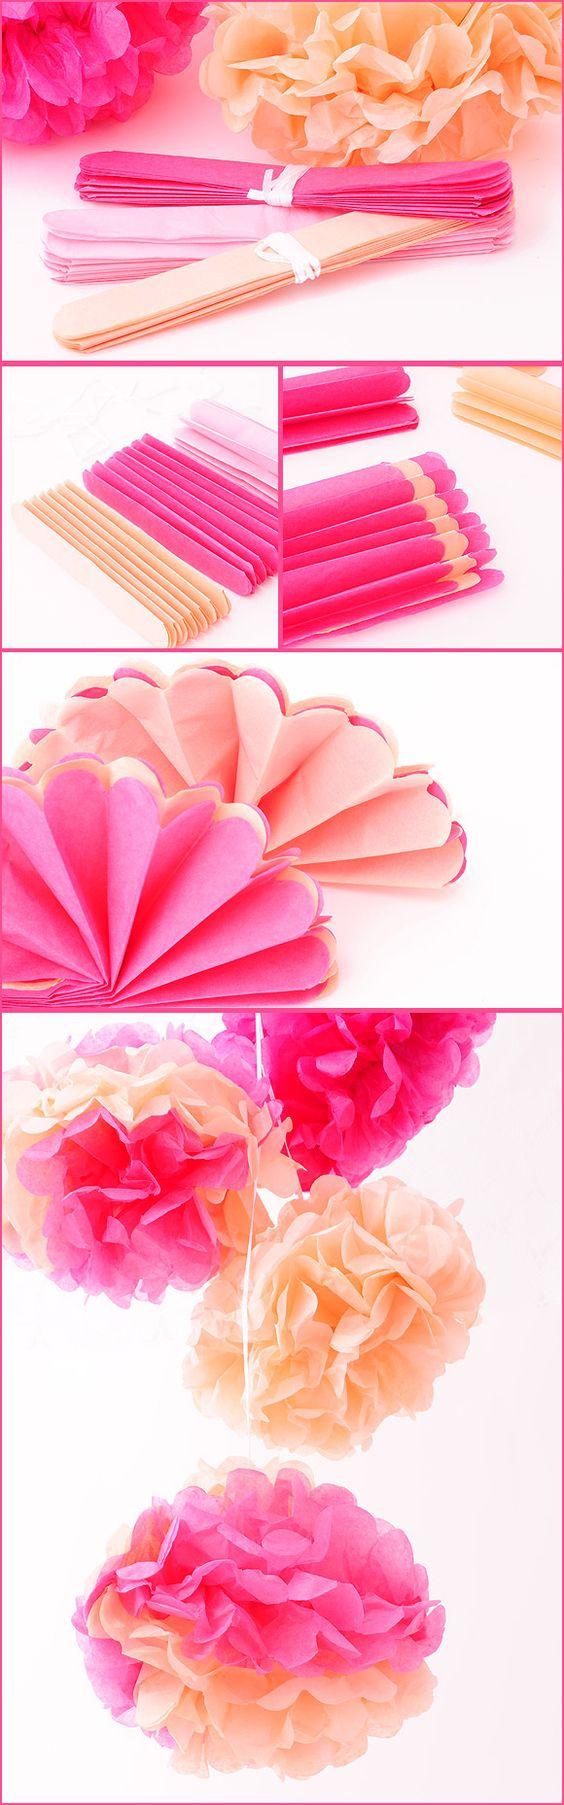 Tissue pom poms flower and brides on pinterest - Decoracion con pompones ...